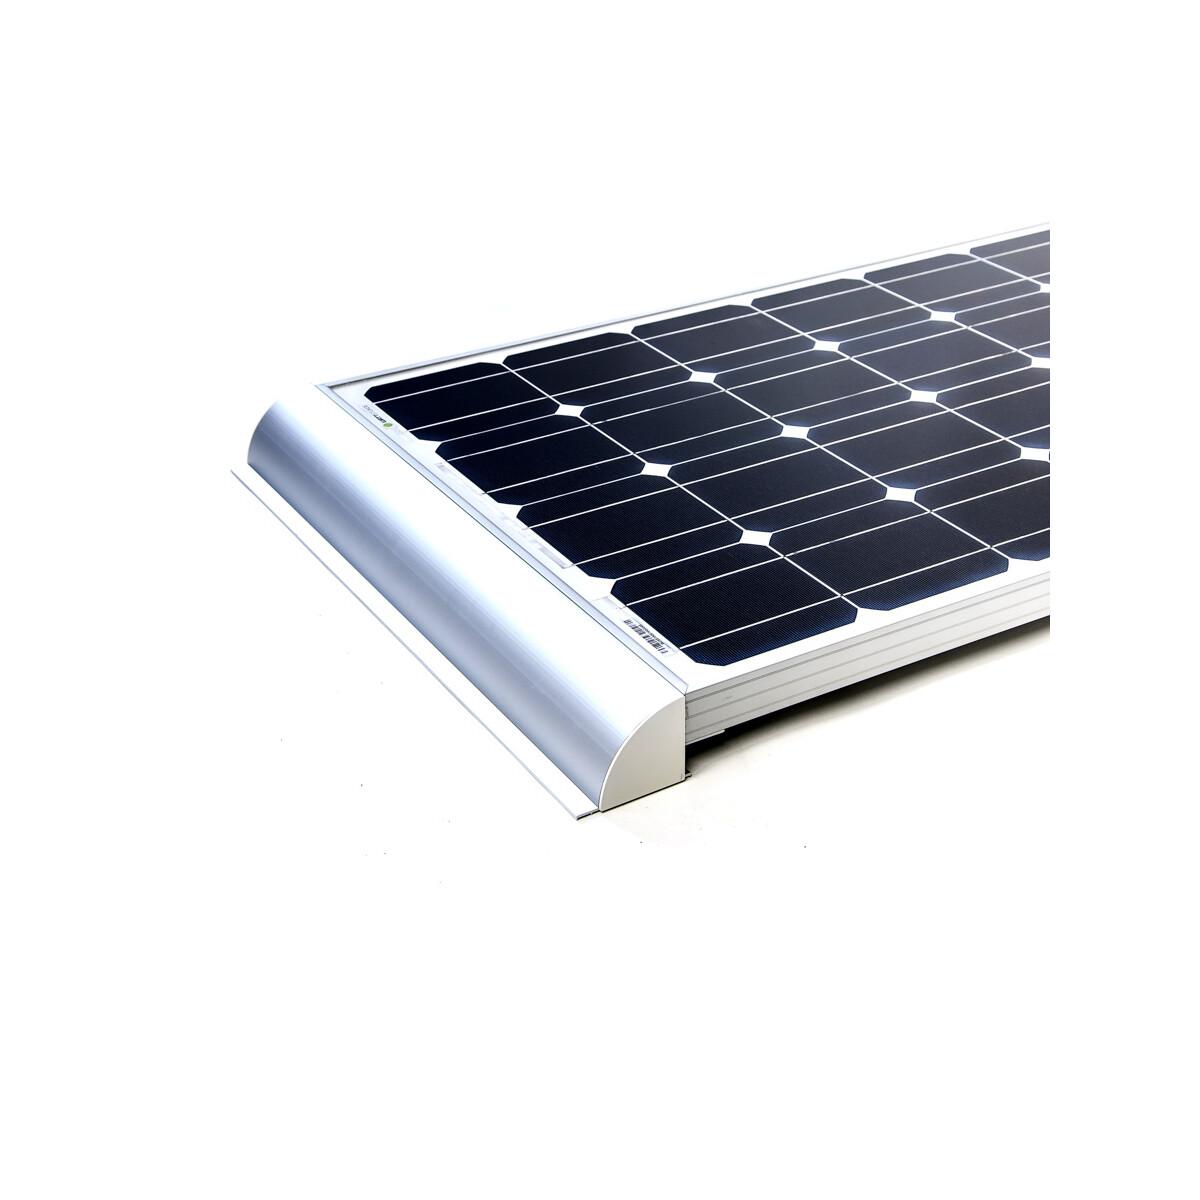 solarmodul halterung wohnmobil dachspoiler hsa68. Black Bedroom Furniture Sets. Home Design Ideas